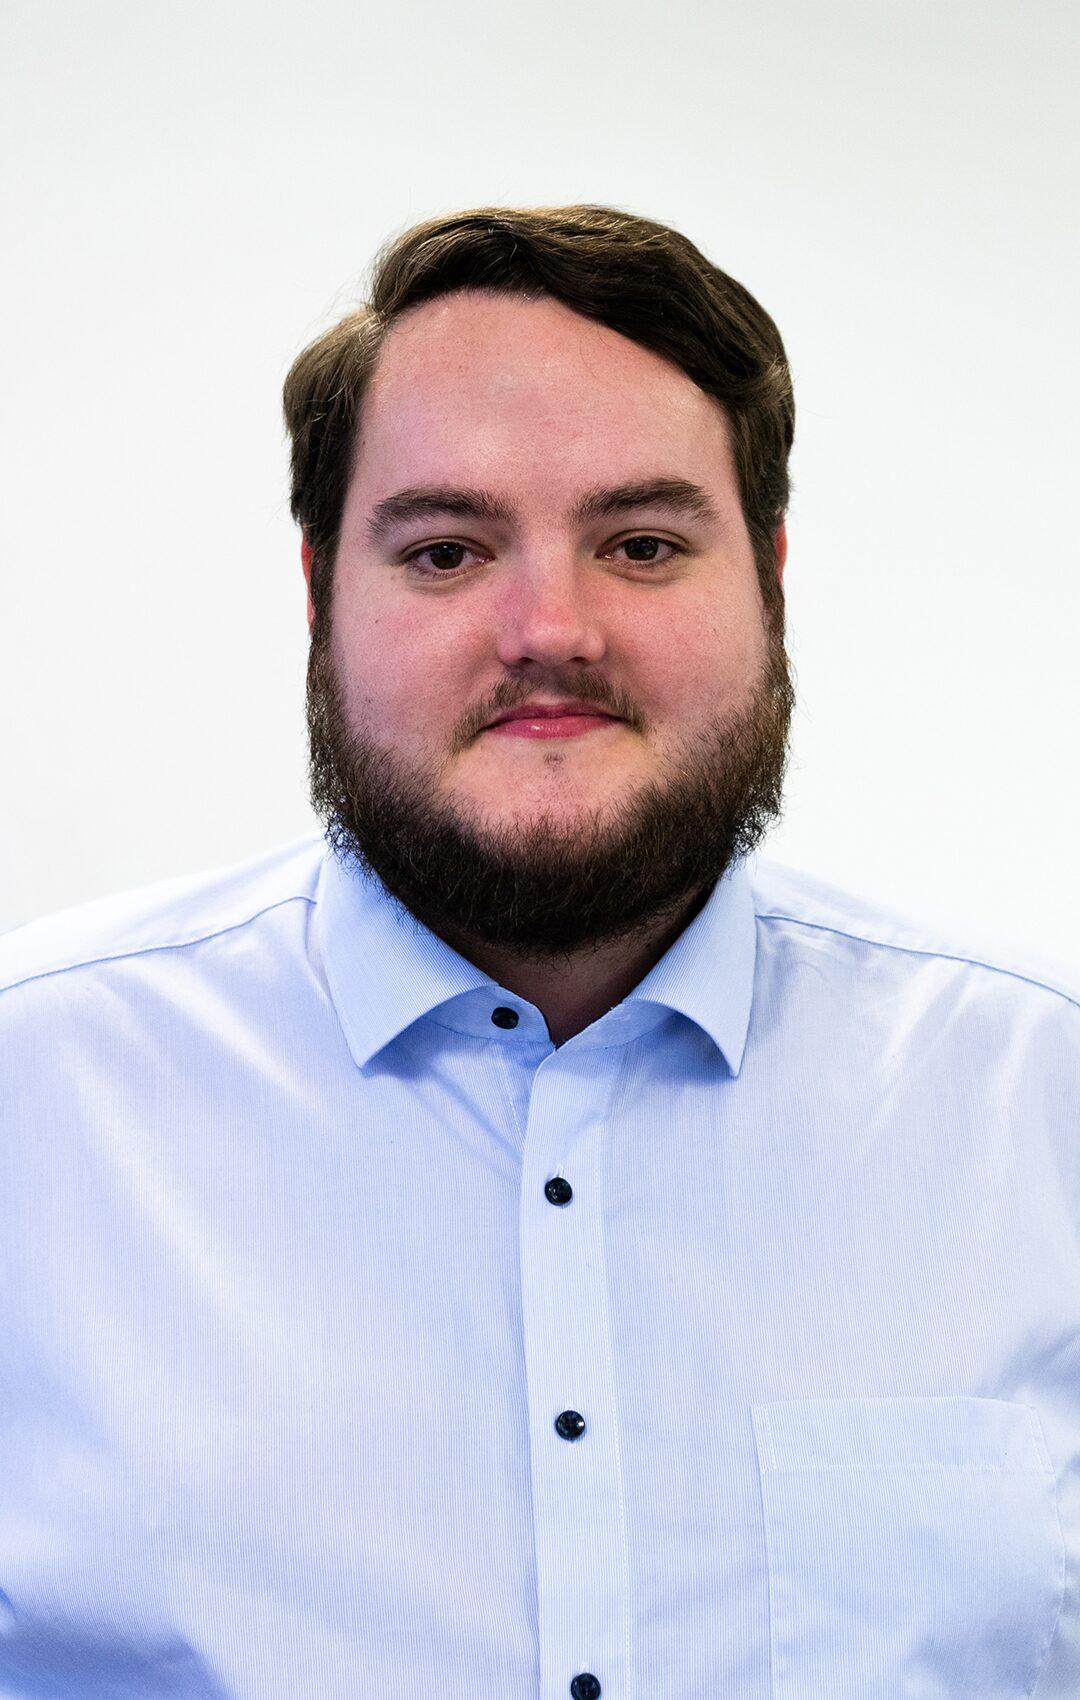 Alexandre Goossaert Responsable Ventes & Marketing chez Evancy